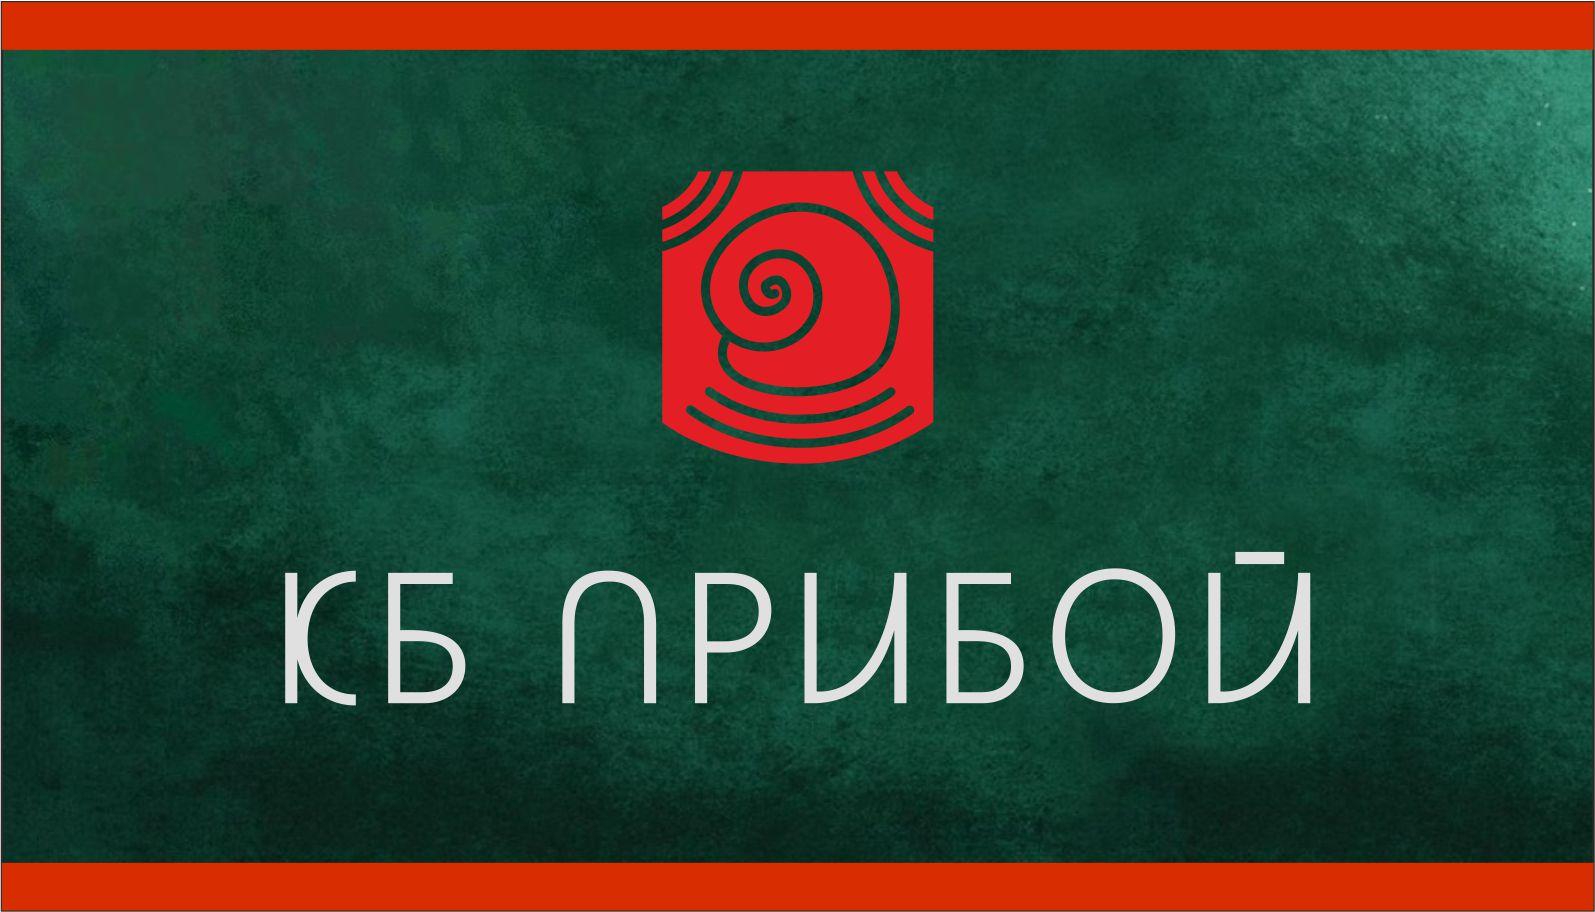 Разработка логотипа и фирменного стиля для КБ Прибой фото f_1595b28fe9f248f7.jpg